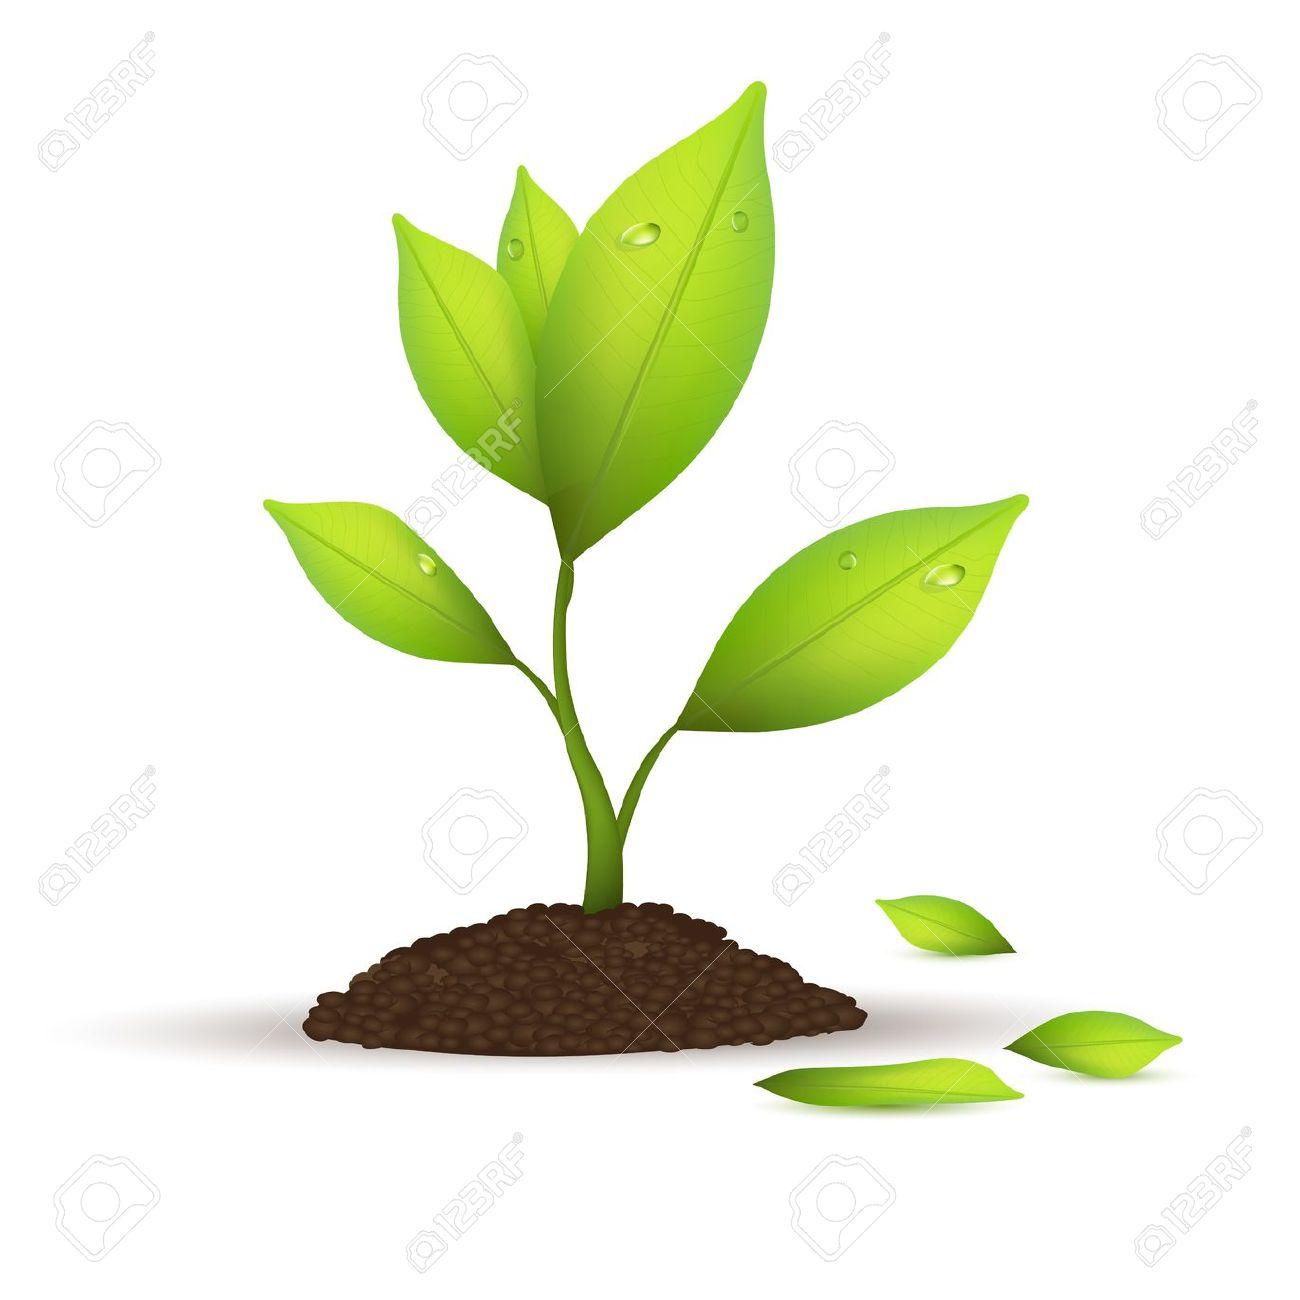 Plant clipart. Care